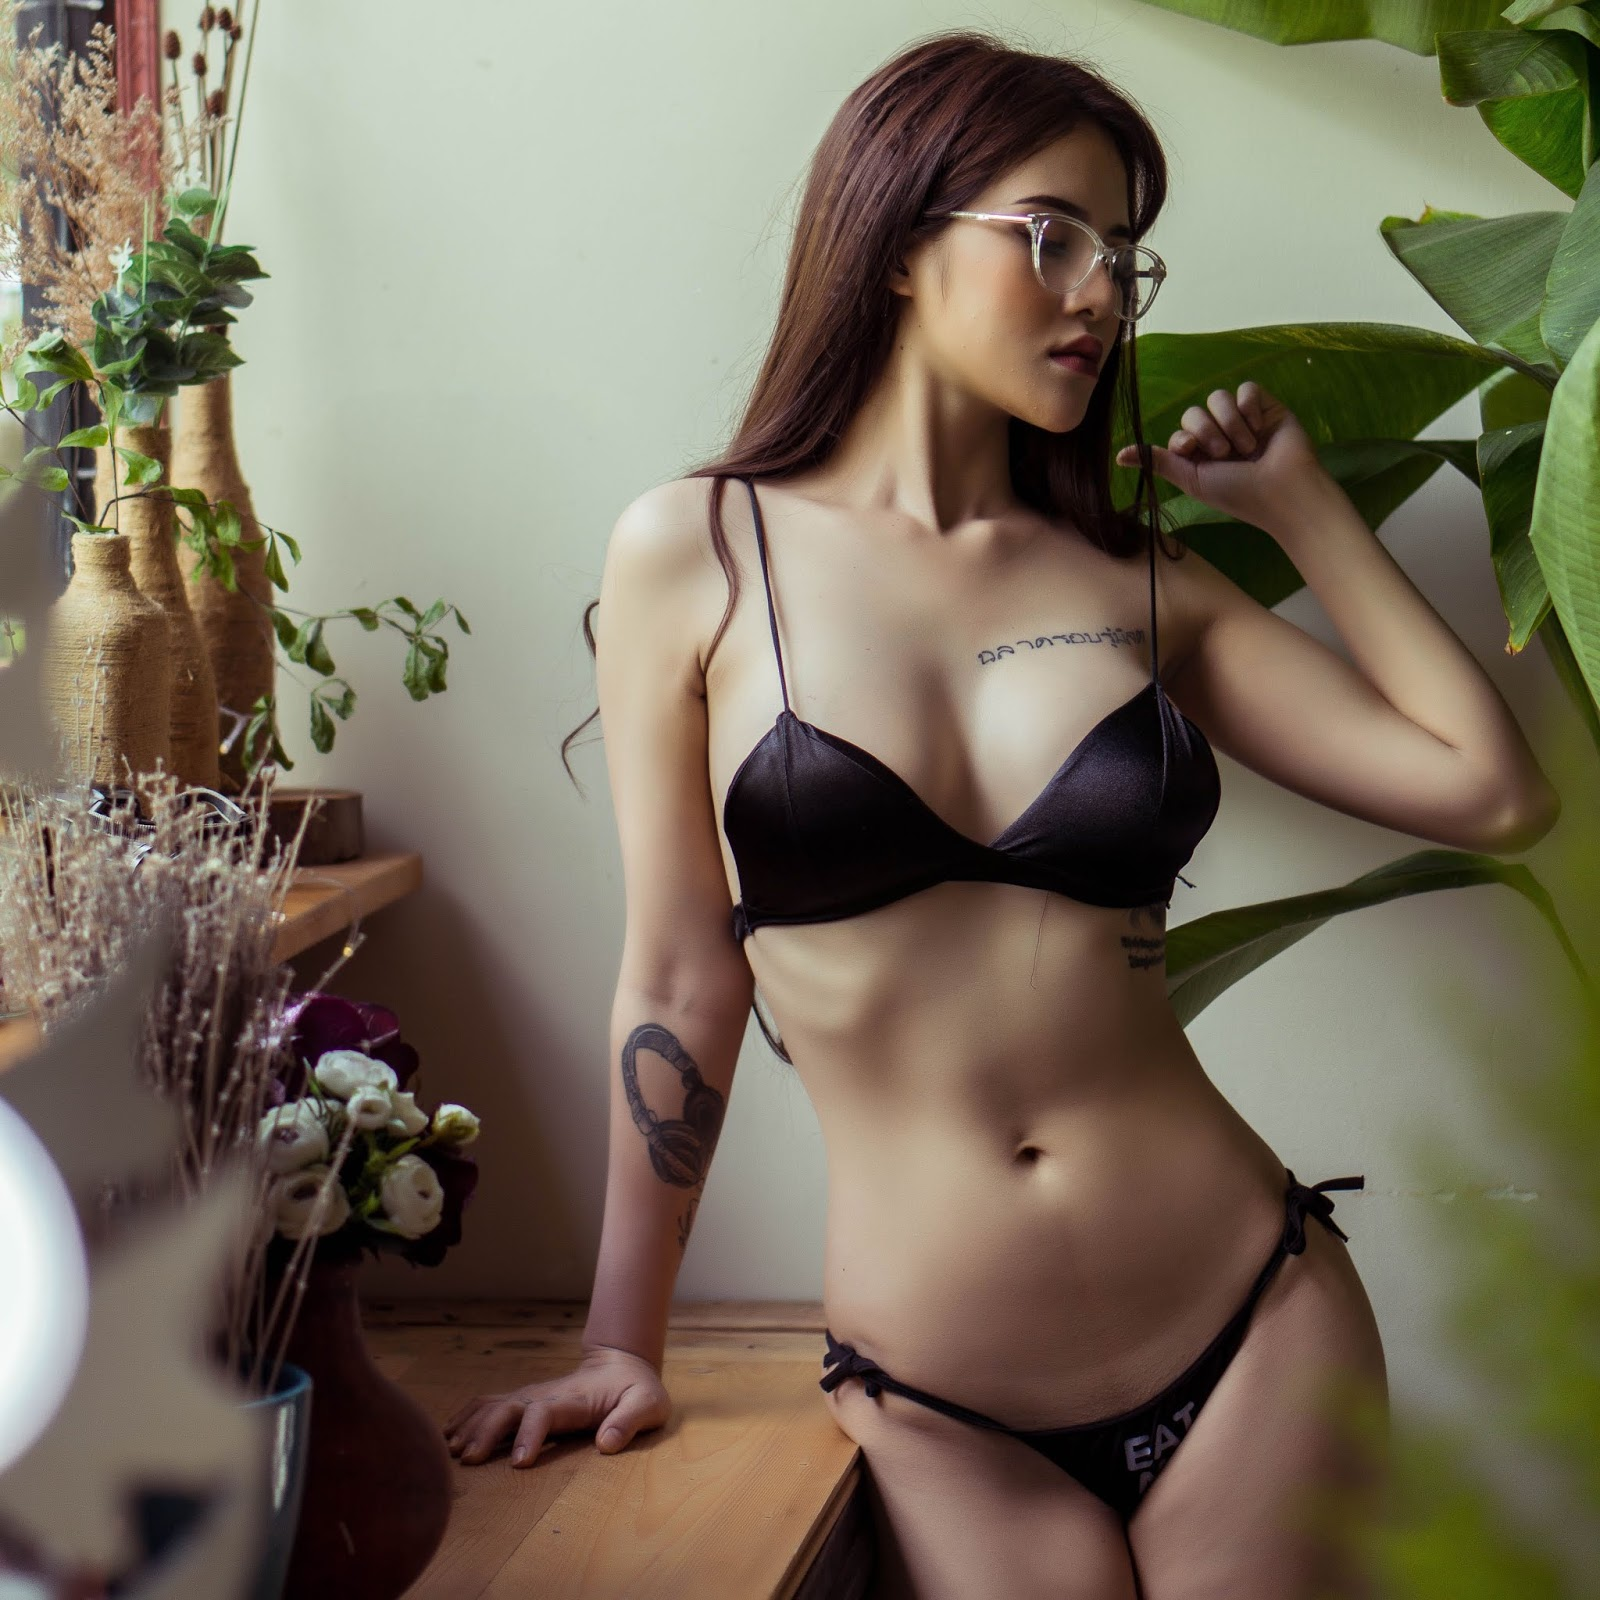 nhanghi69 linh%2Bkem%2Bkhoe%2Bhinh%2Bthe%2Bnong%2Bbong%2B%25287%2529 - Hot Girl DJ Linh Kem